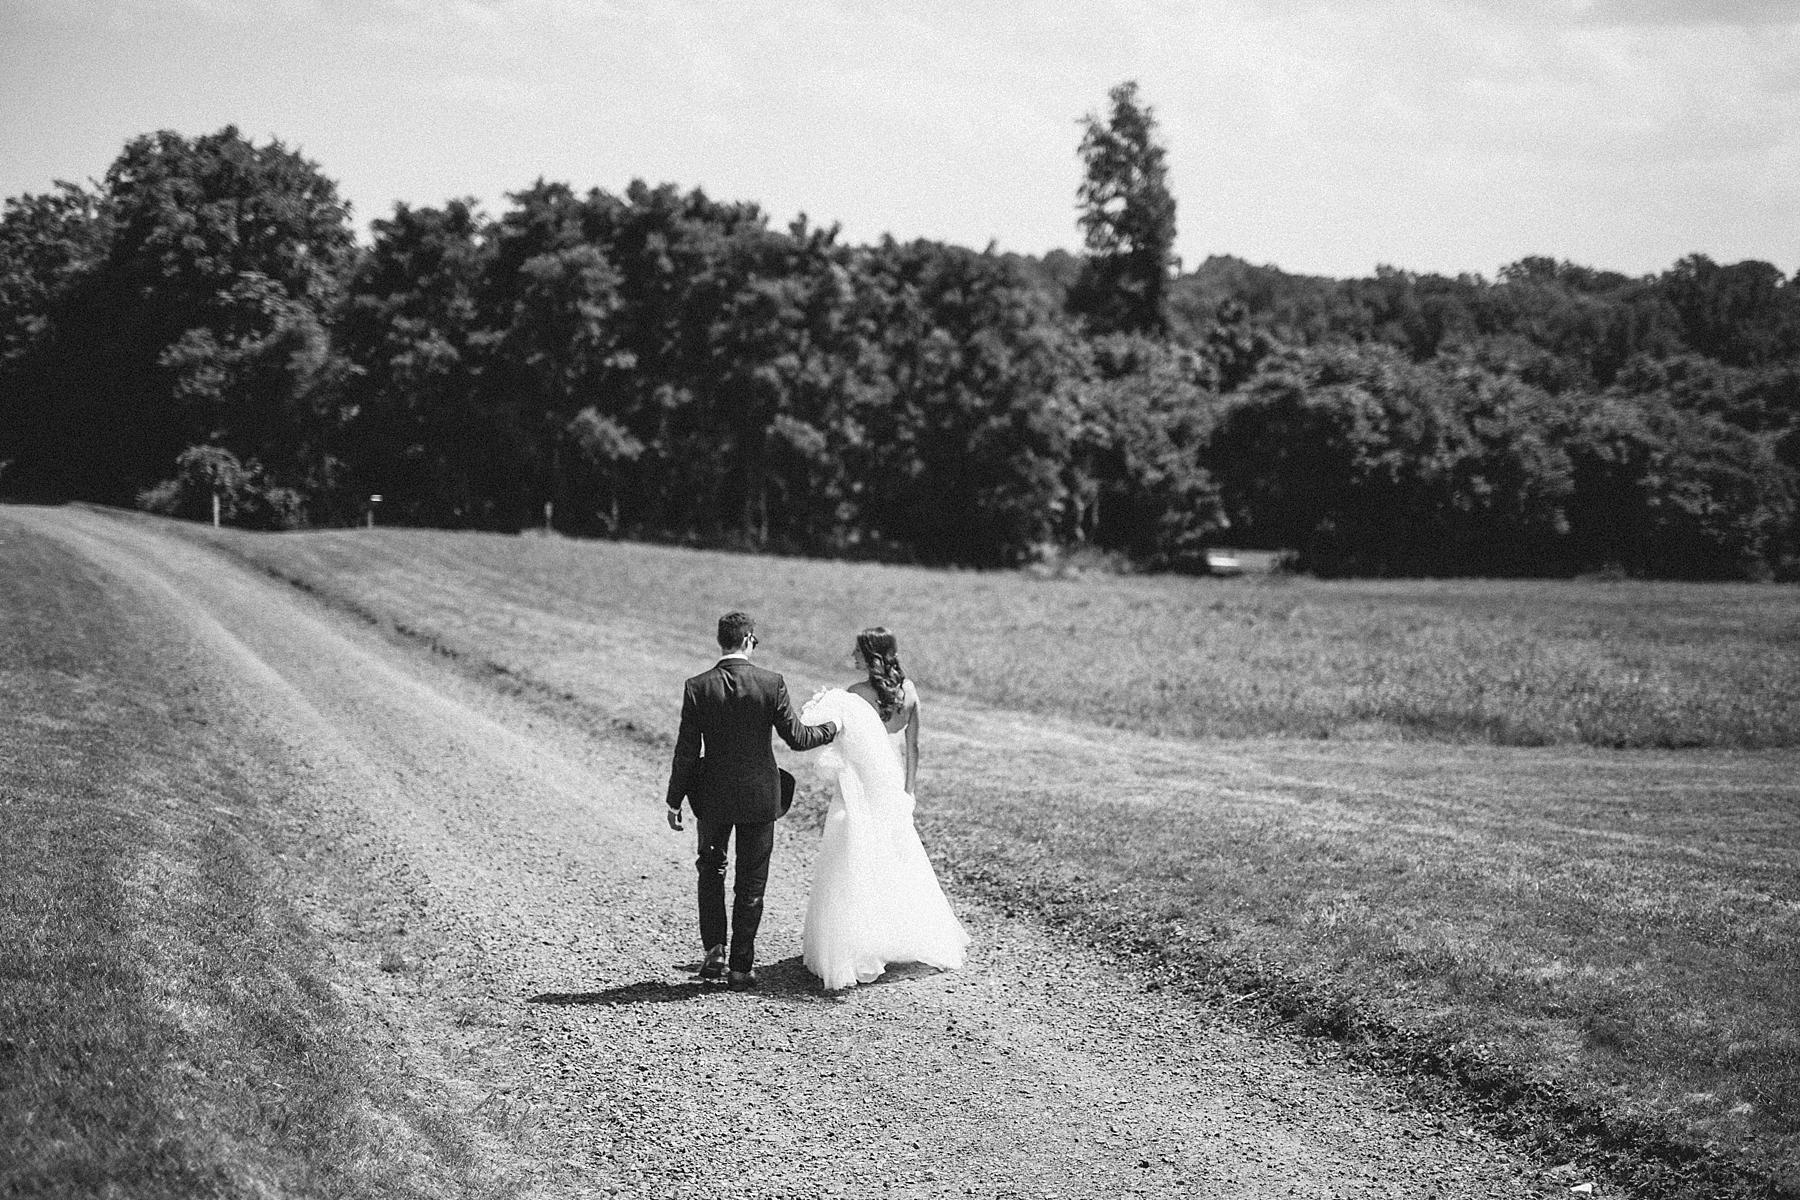 farm-country-wedding-nj-photographer-red-bank_0026.jpg